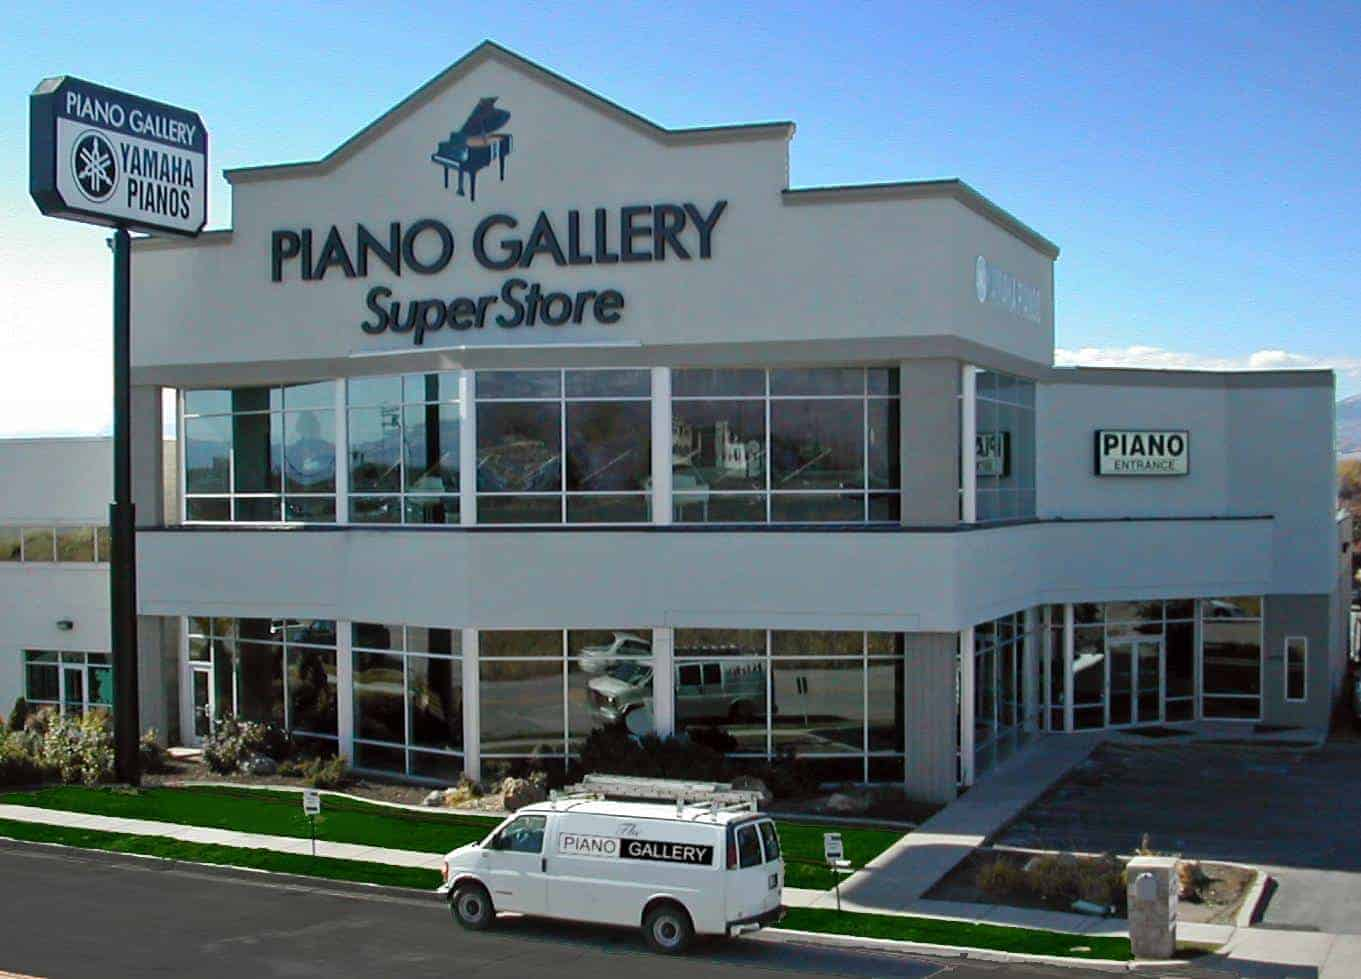 Piano gallery utah 39 s premier piano store top 5 yamaha for Yamaha piano dealer near me